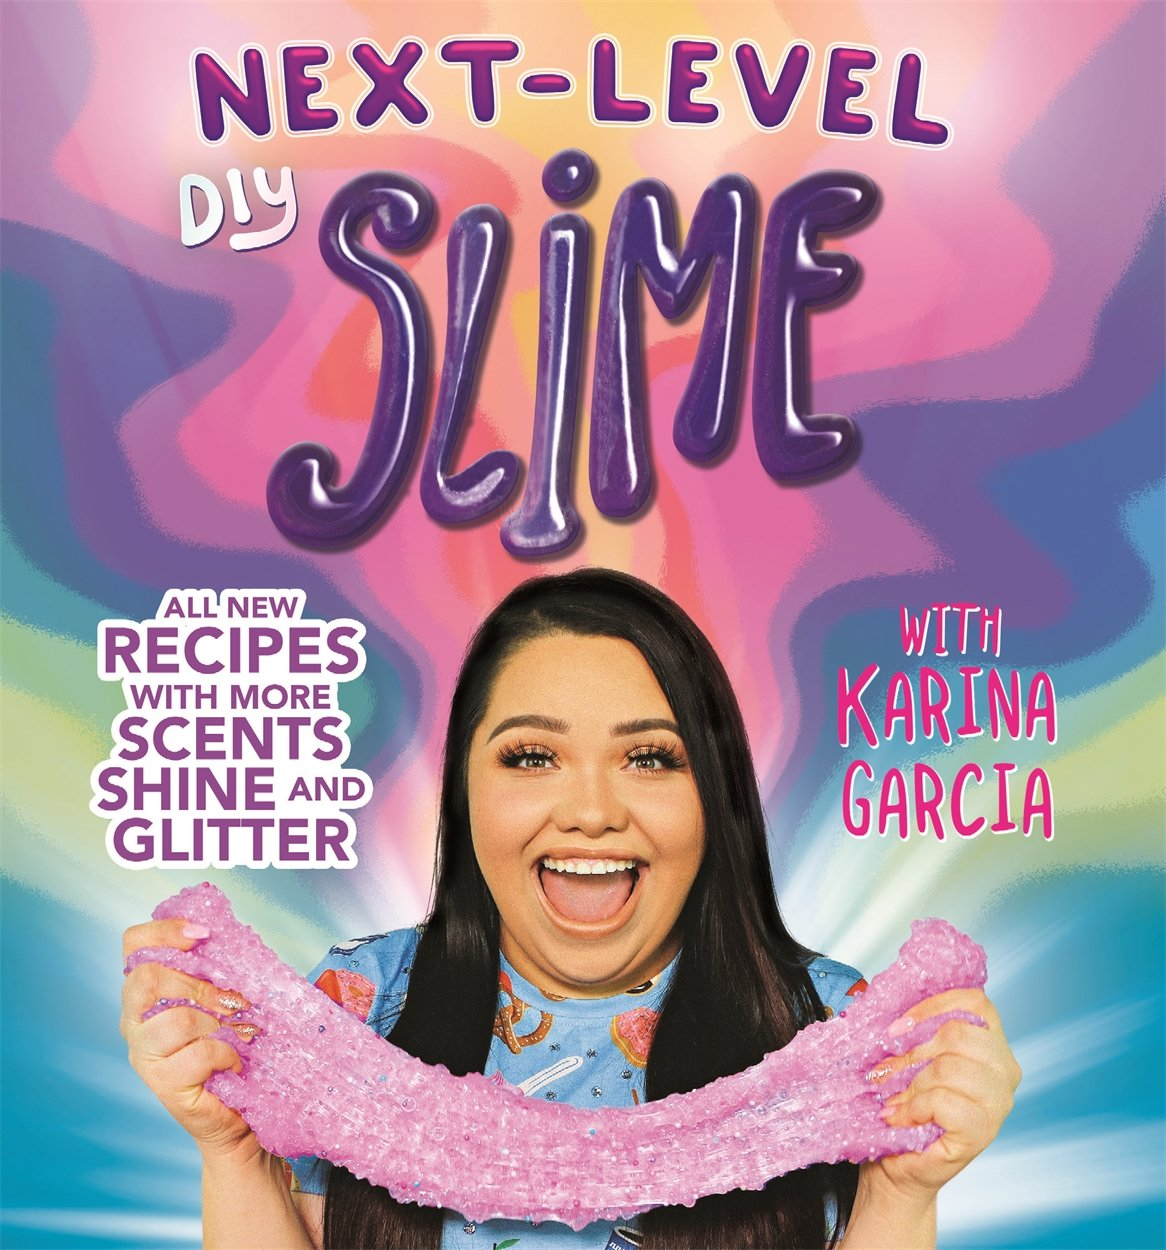 Garcia, K: Karina Garcias Next-Level DIY Slime: Amazon.es: Garcia, Karina: Libros en idiomas extranjeros